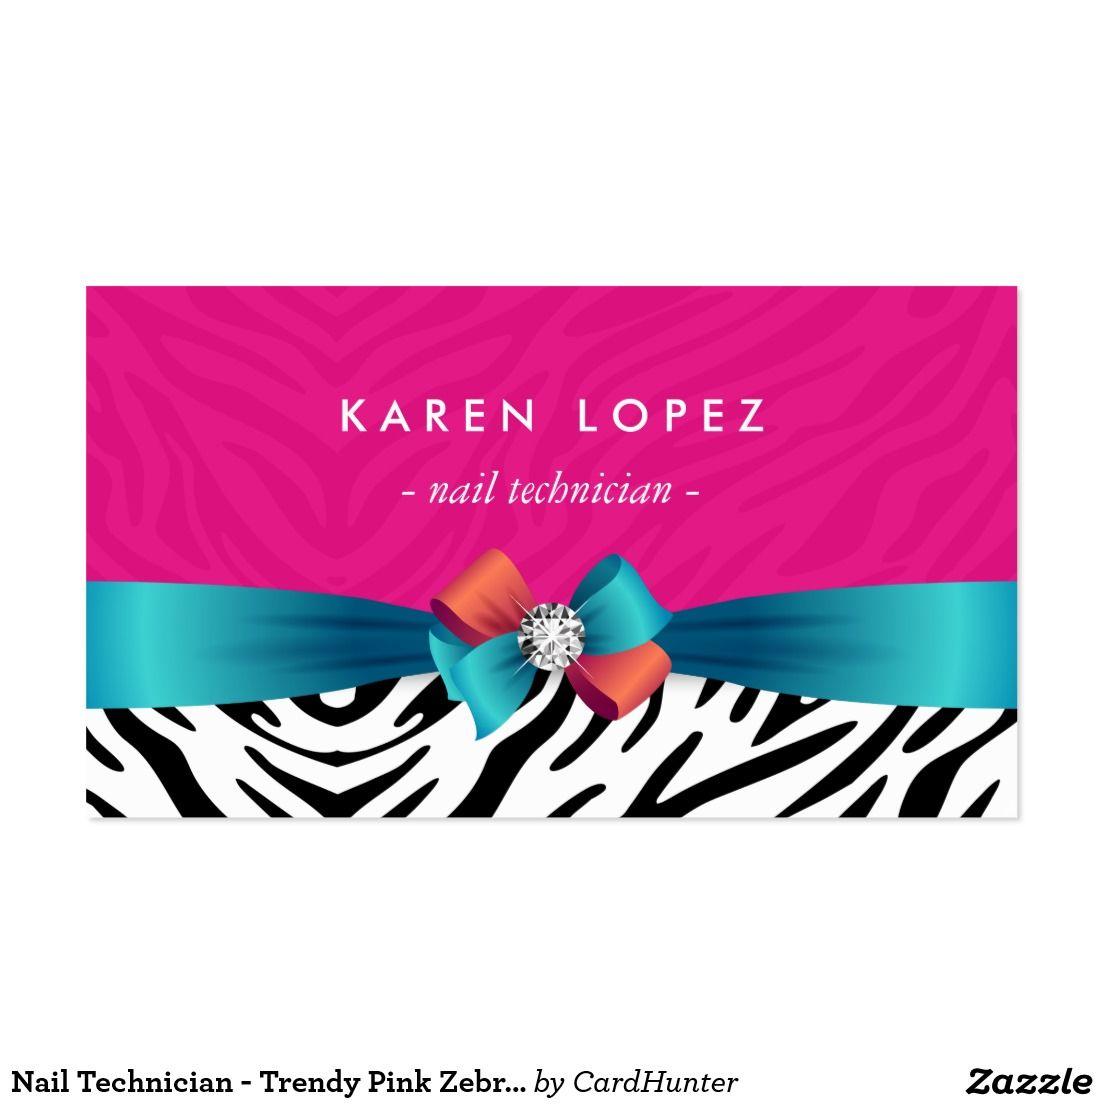 Nail Technician - Trendy Pink Zebra Print Business Card | Business ...